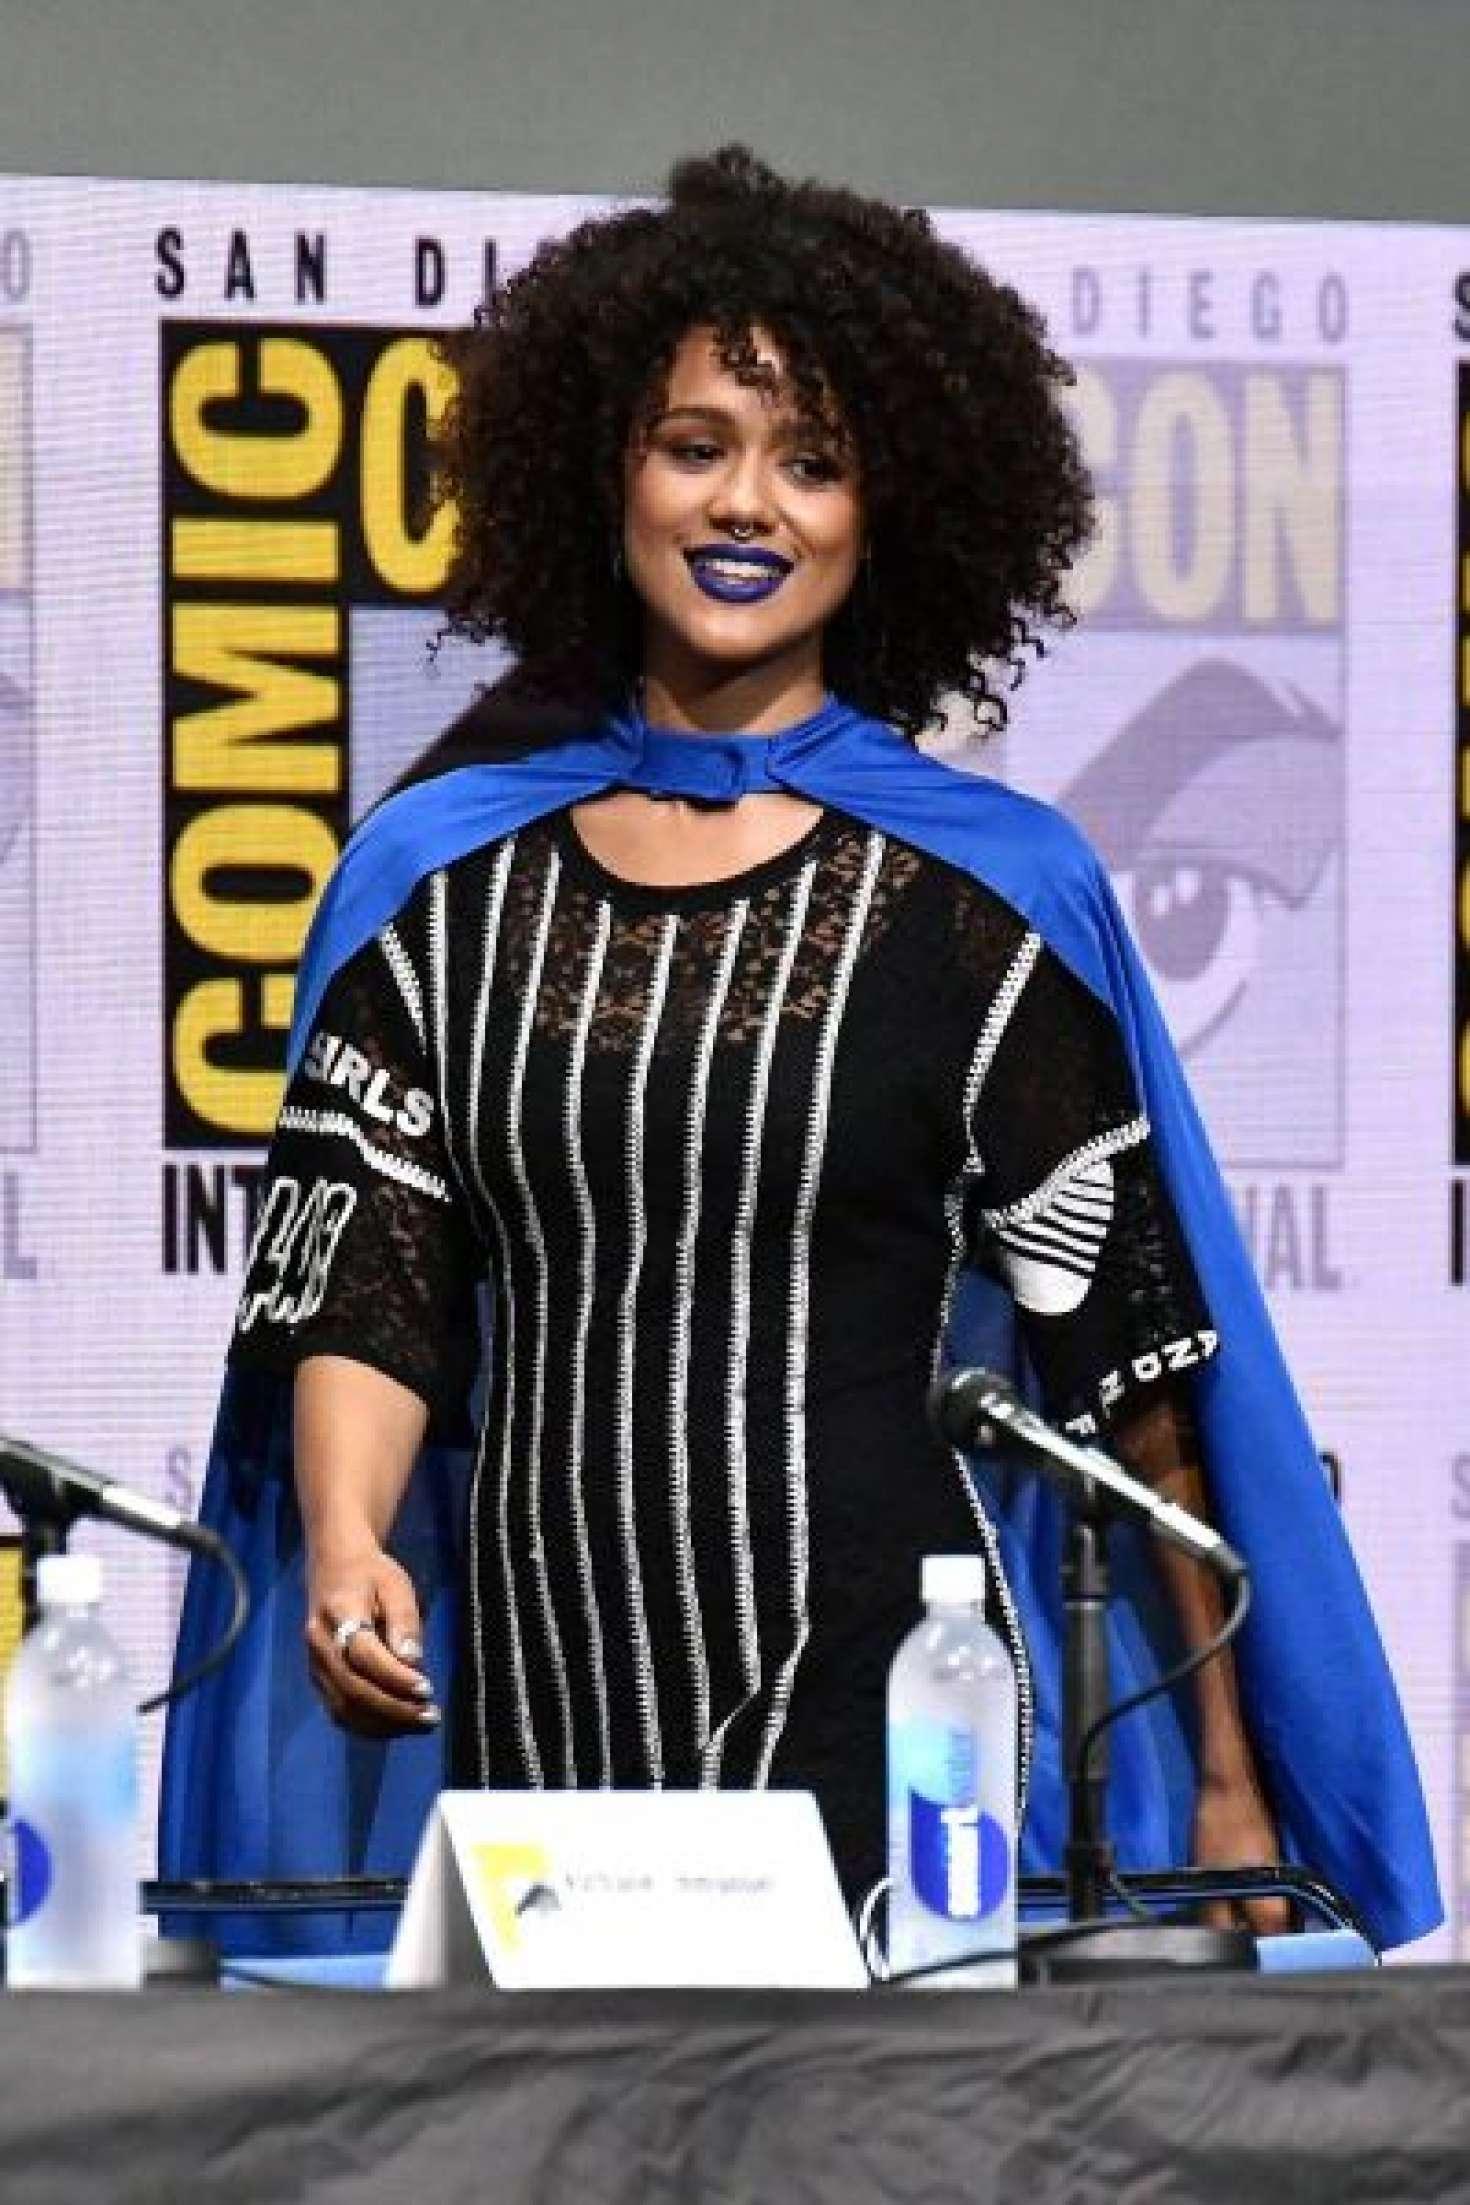 Nathalie Emmanuel at 2017 Comic-Con in San Diego